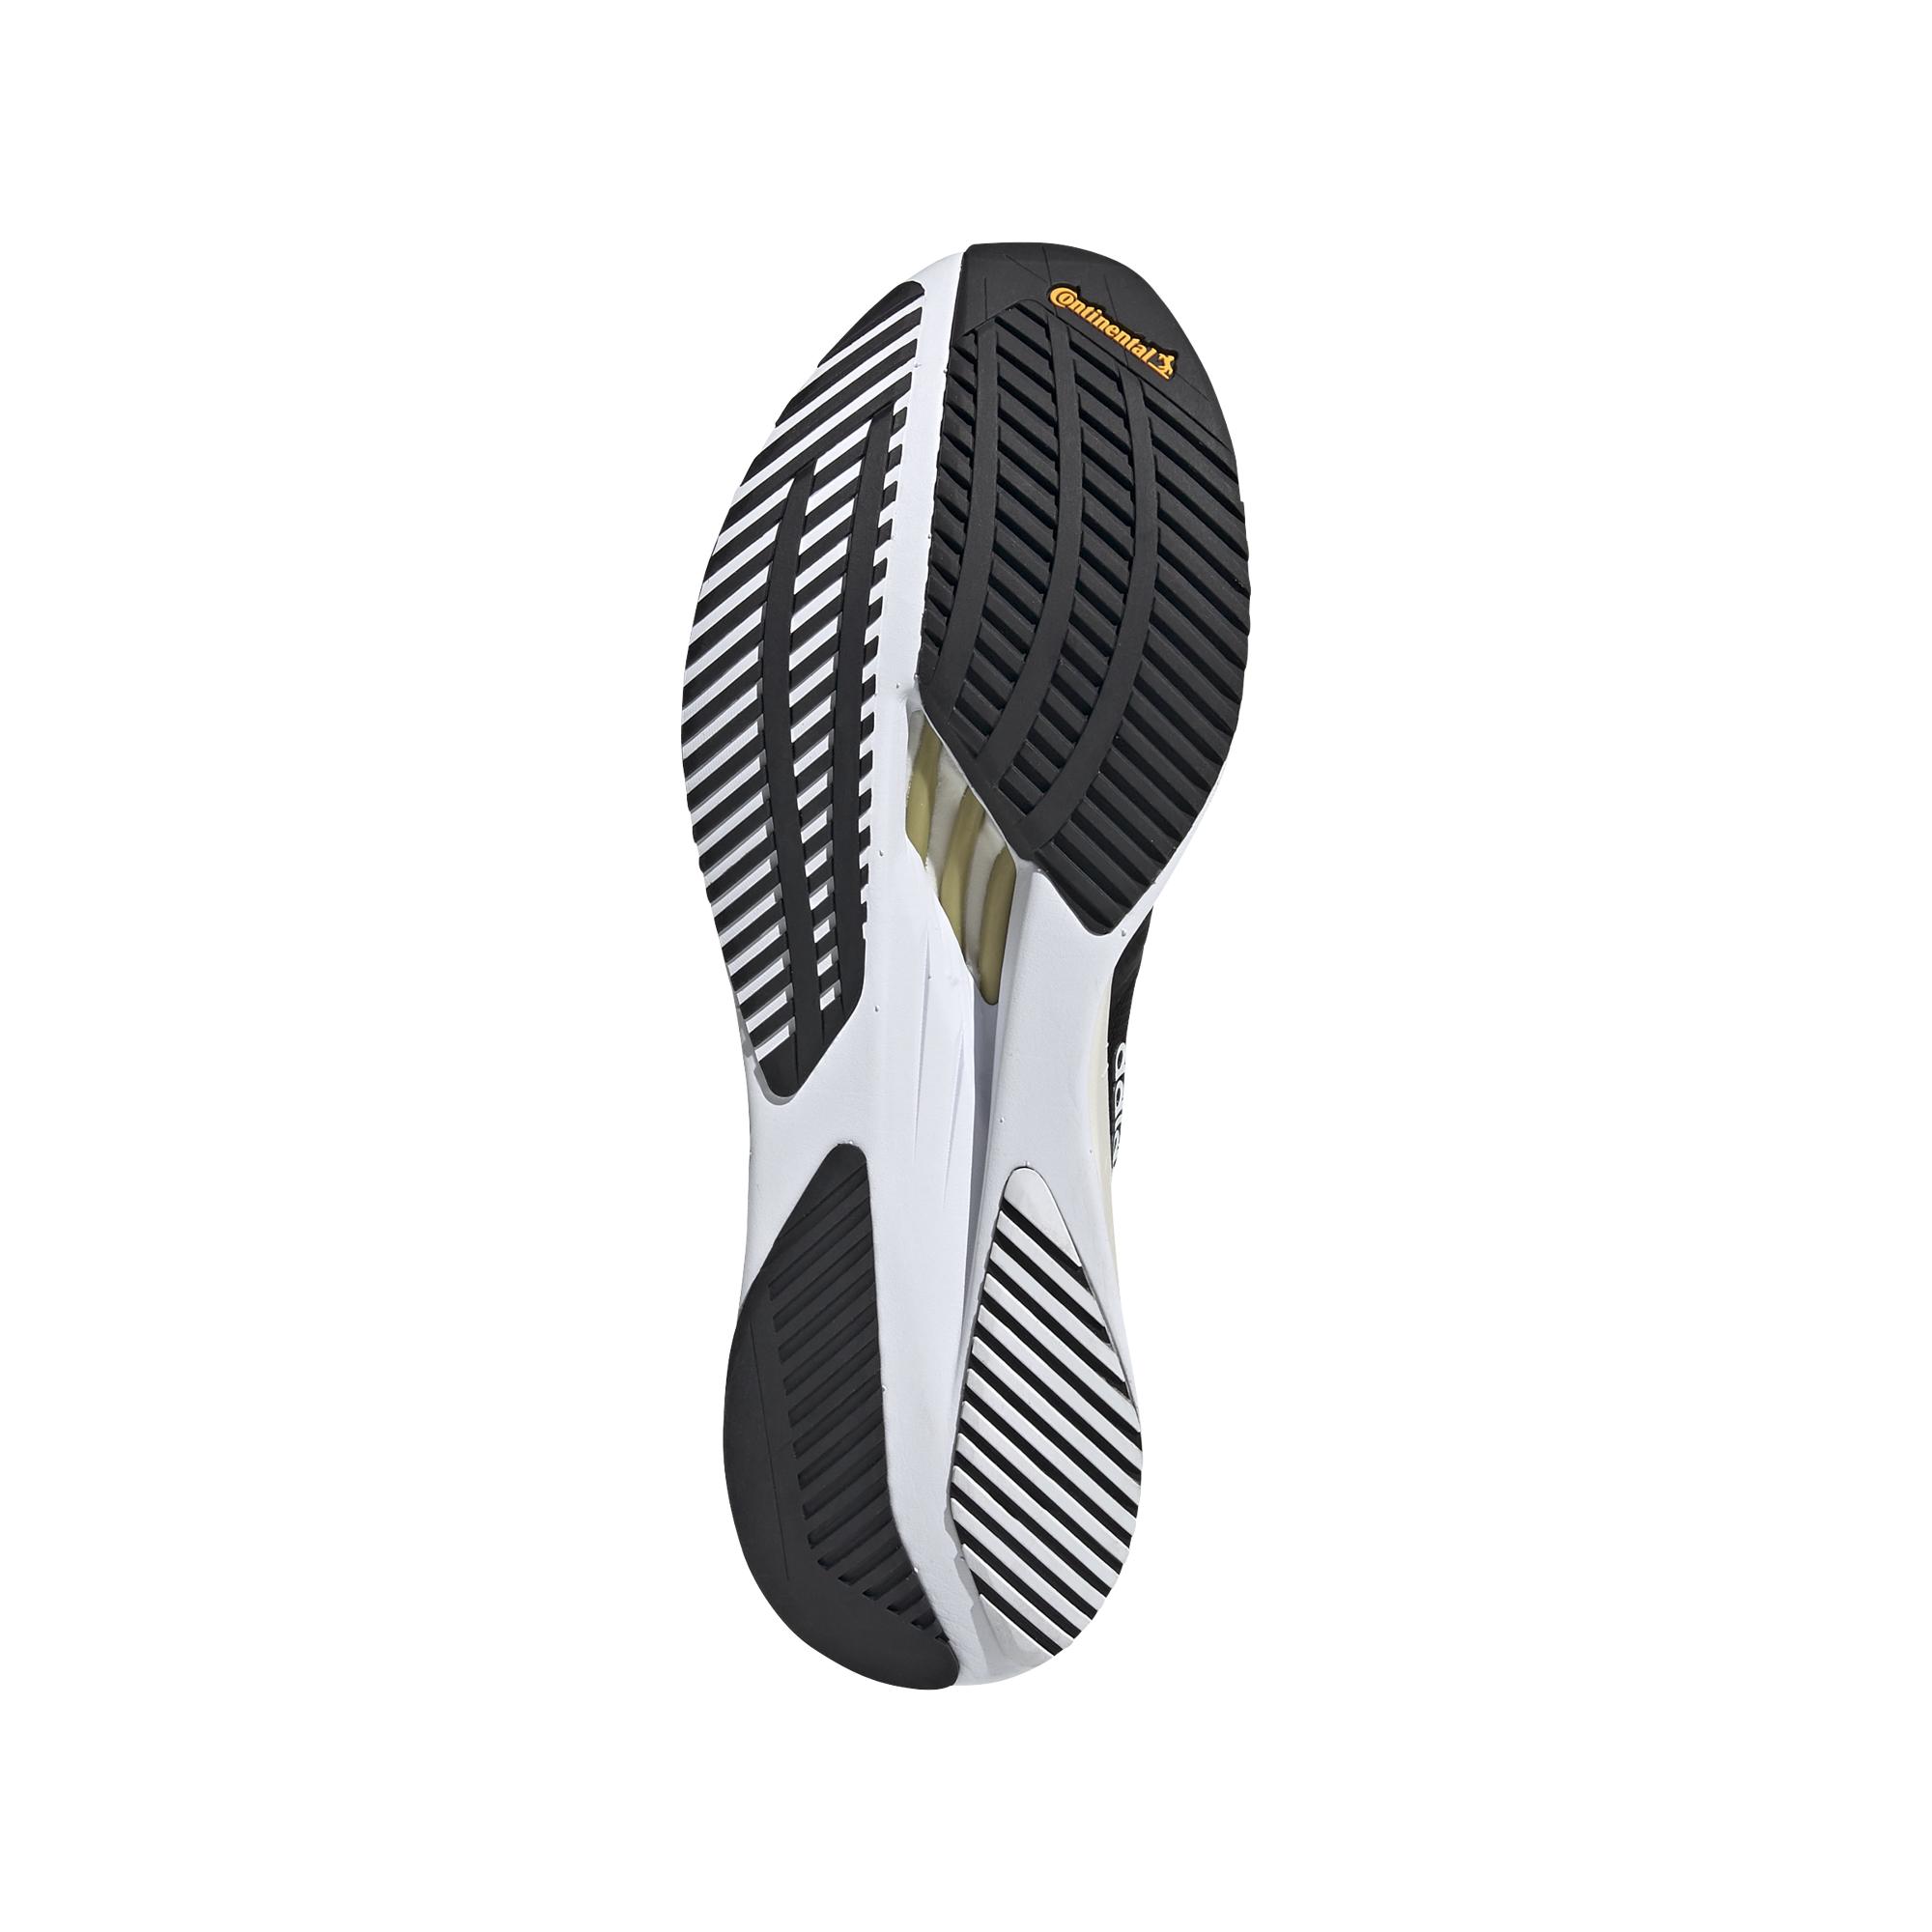 Men's Adidas Adizero Boston 10 Running Shoe - Color: Core Black / Cloud White / Gold Metallic - Size: 6.5 - Width: Regular, Core Black / Cloud White / Gold Metallic, large, image 4